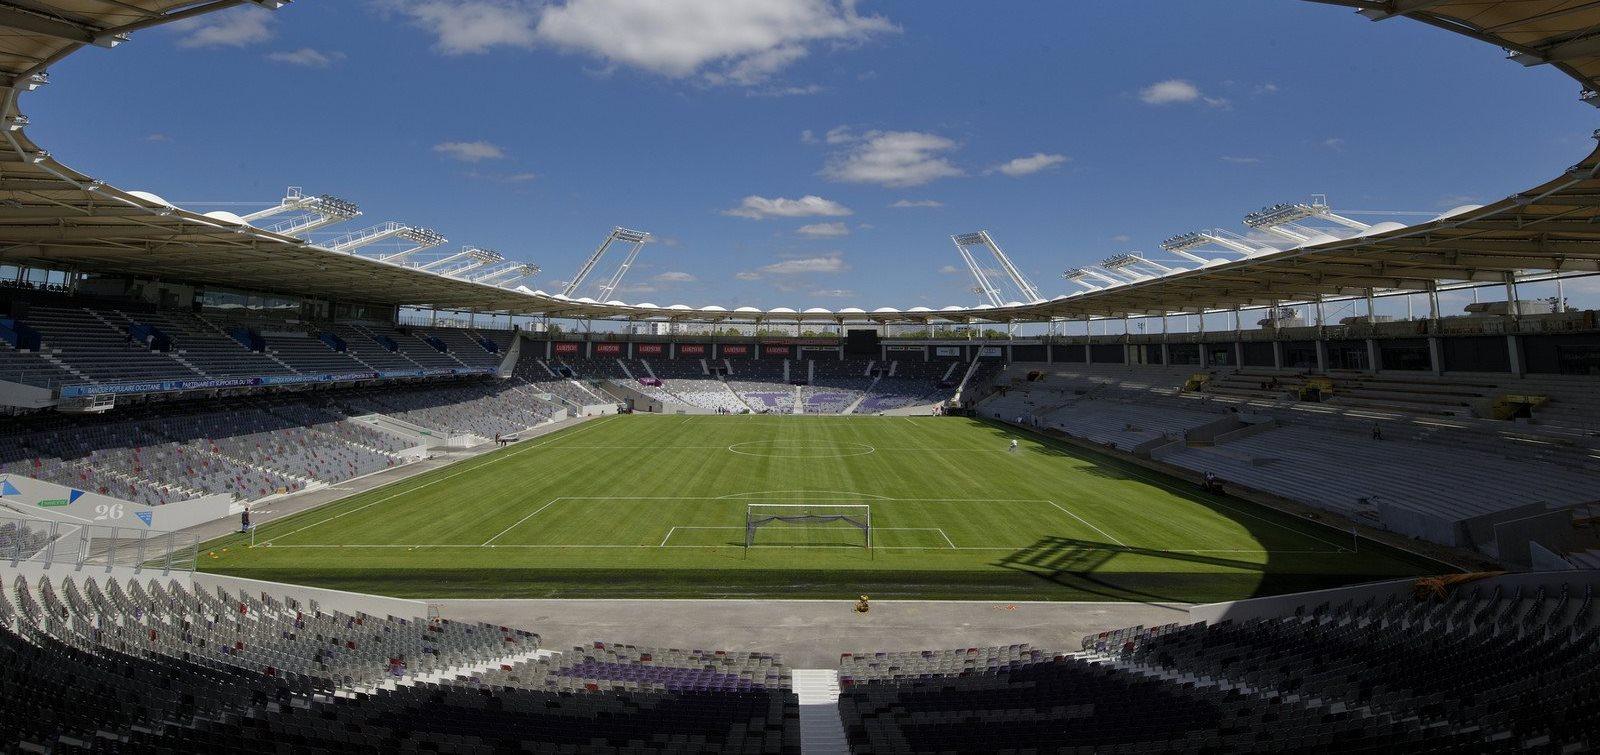 Toulouse FC vs OGC Nice at Stadium Municipal on 15/02/20 Sat 20:00 ...